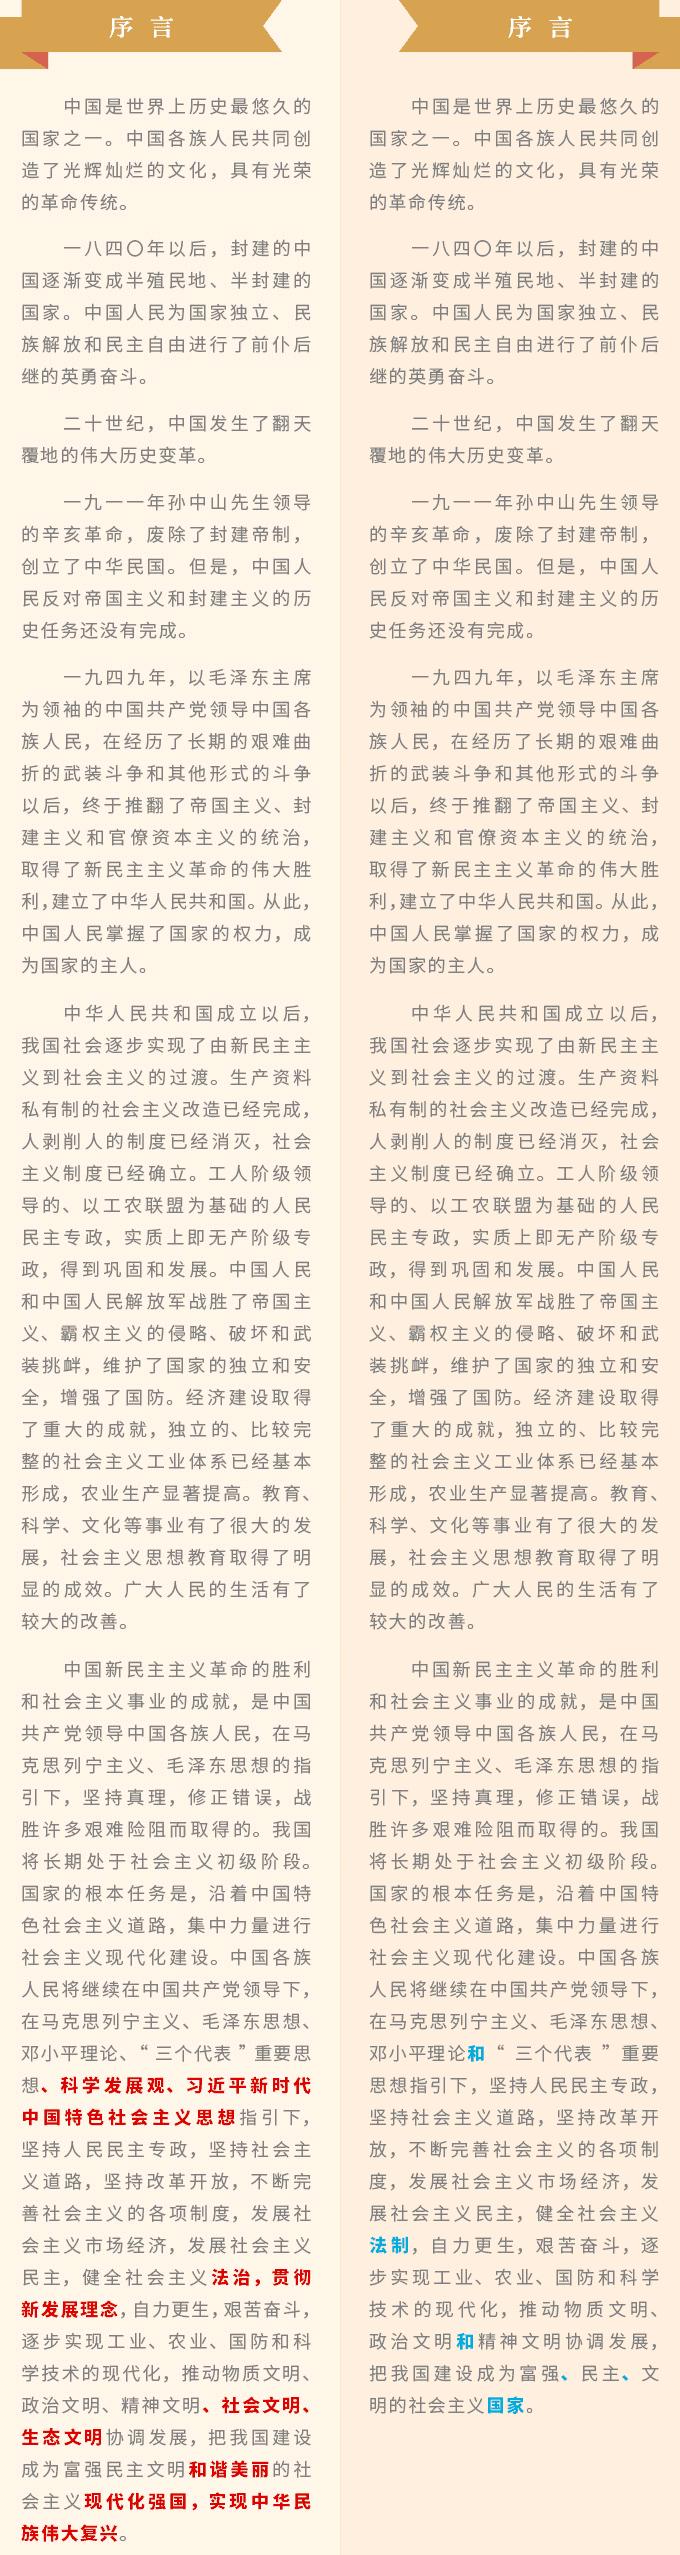 http://www.ccdi.gov.cn/toutiao/201803/W020180309742805611161.png